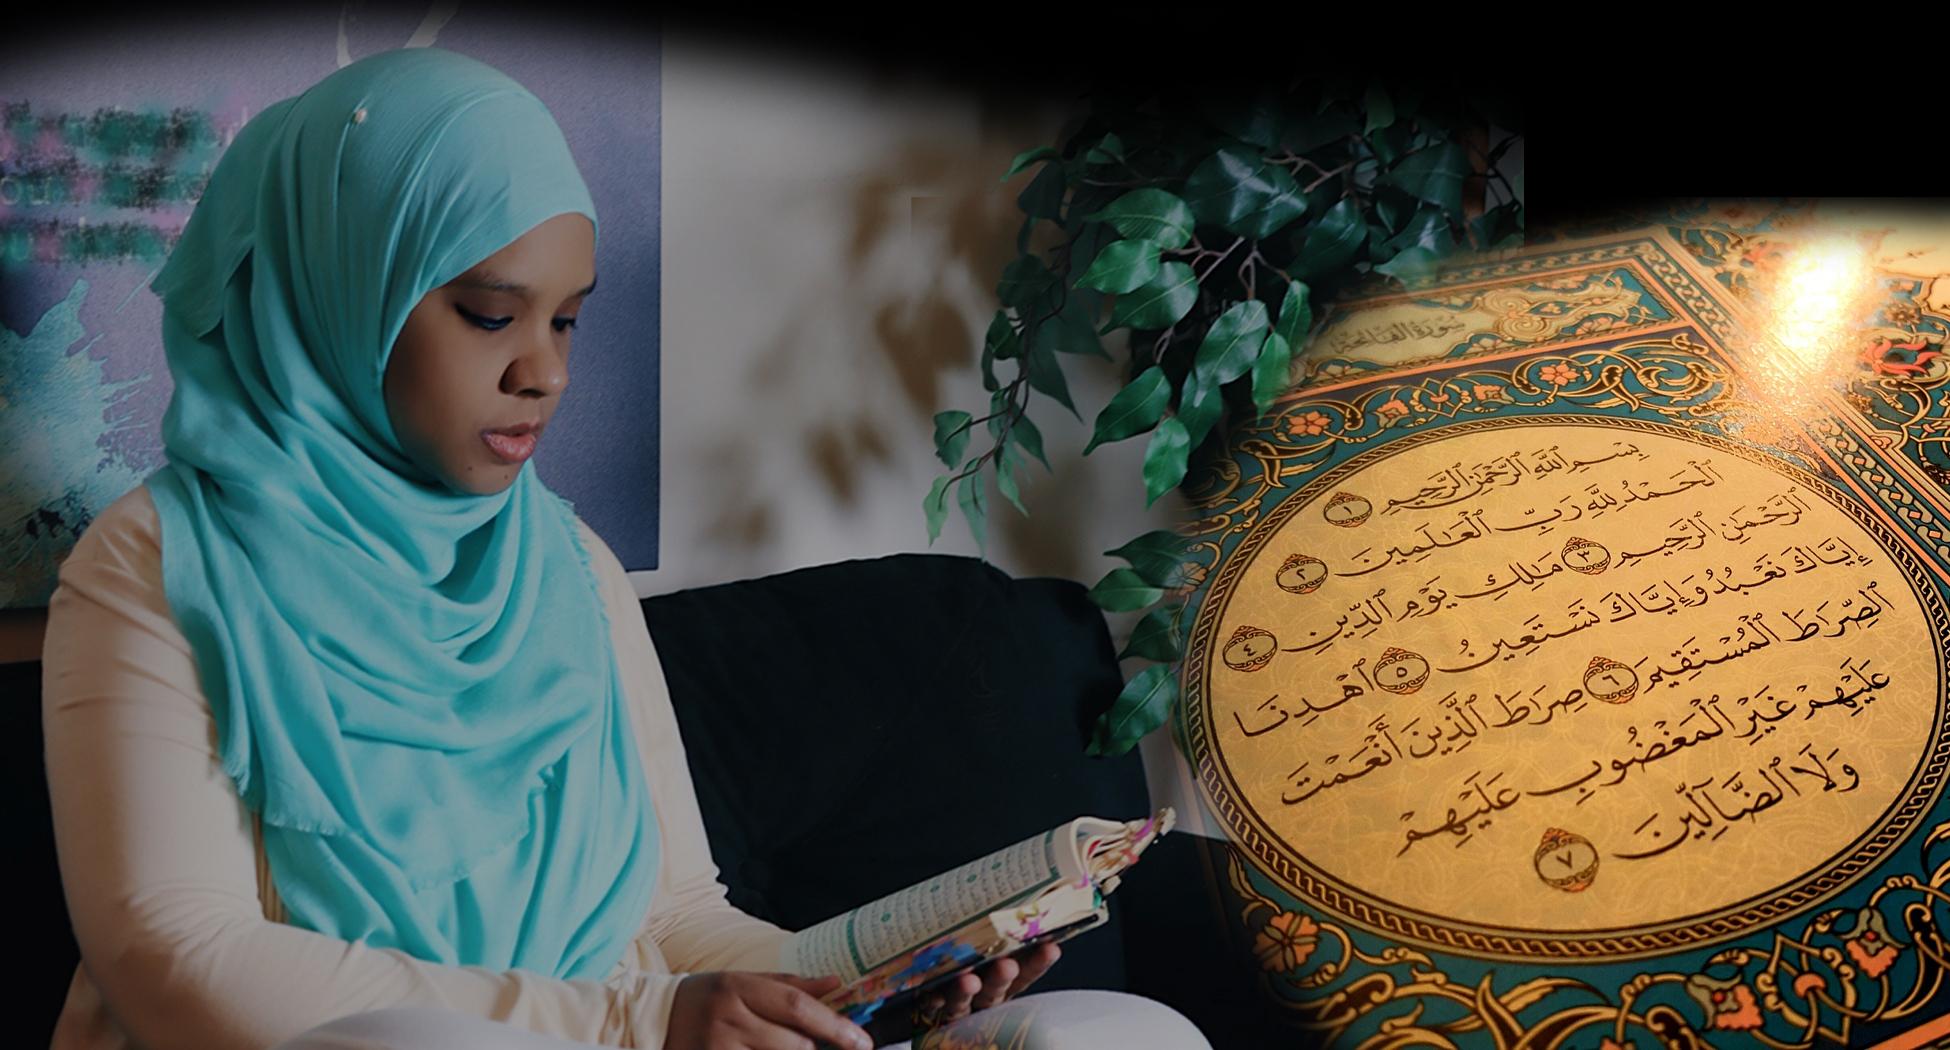 Photo of Umm Zakiyyah in blue hijab reading Qur